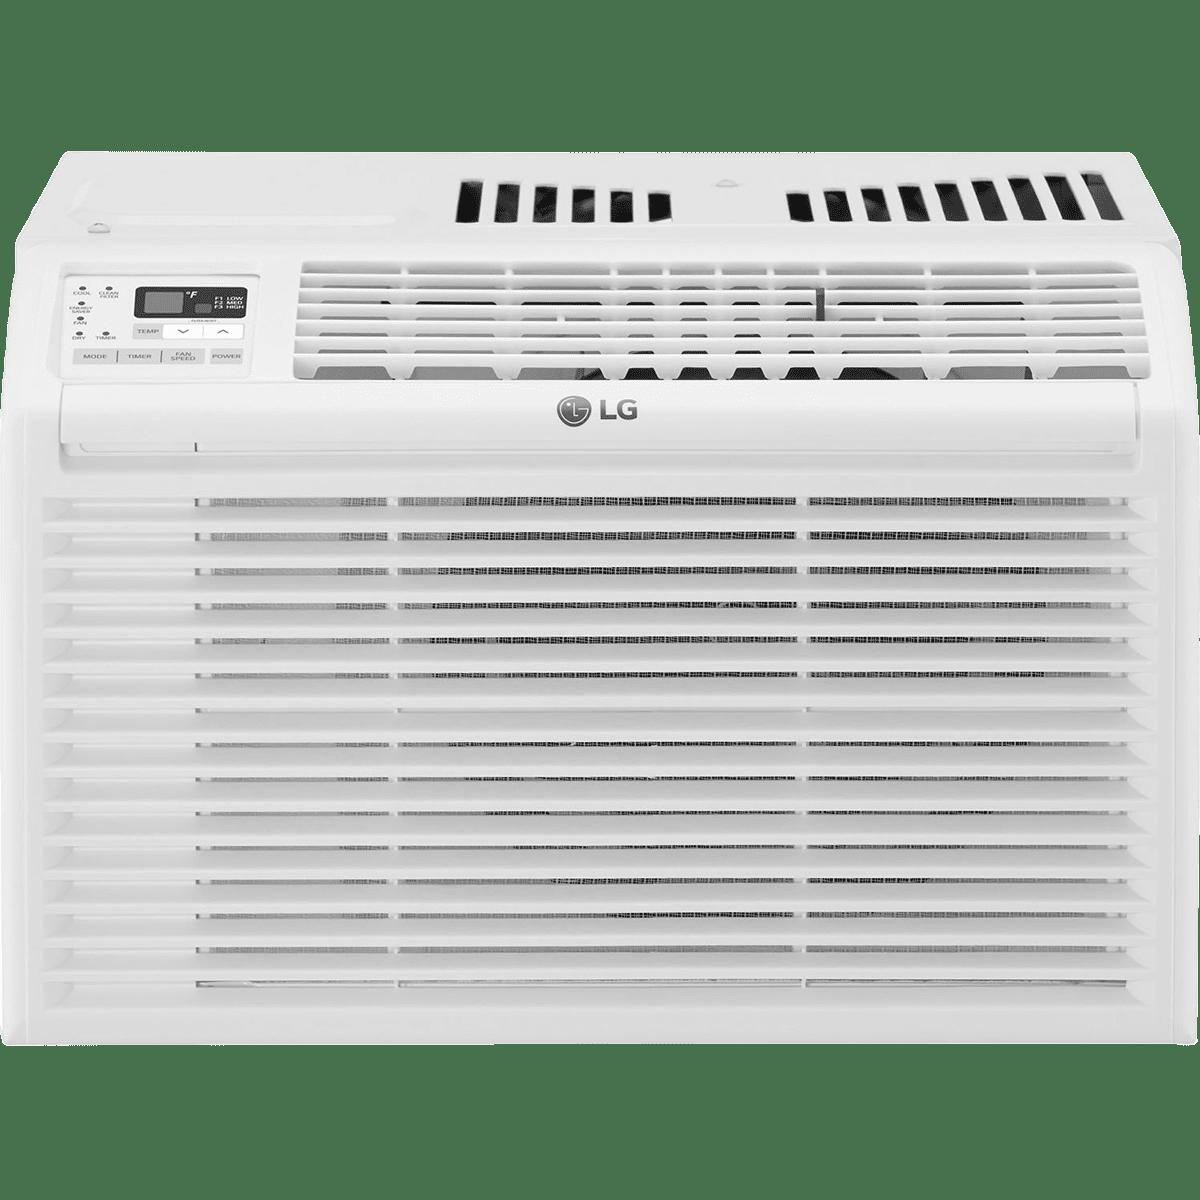 LG 6,000 BTU Window Air Conditioner